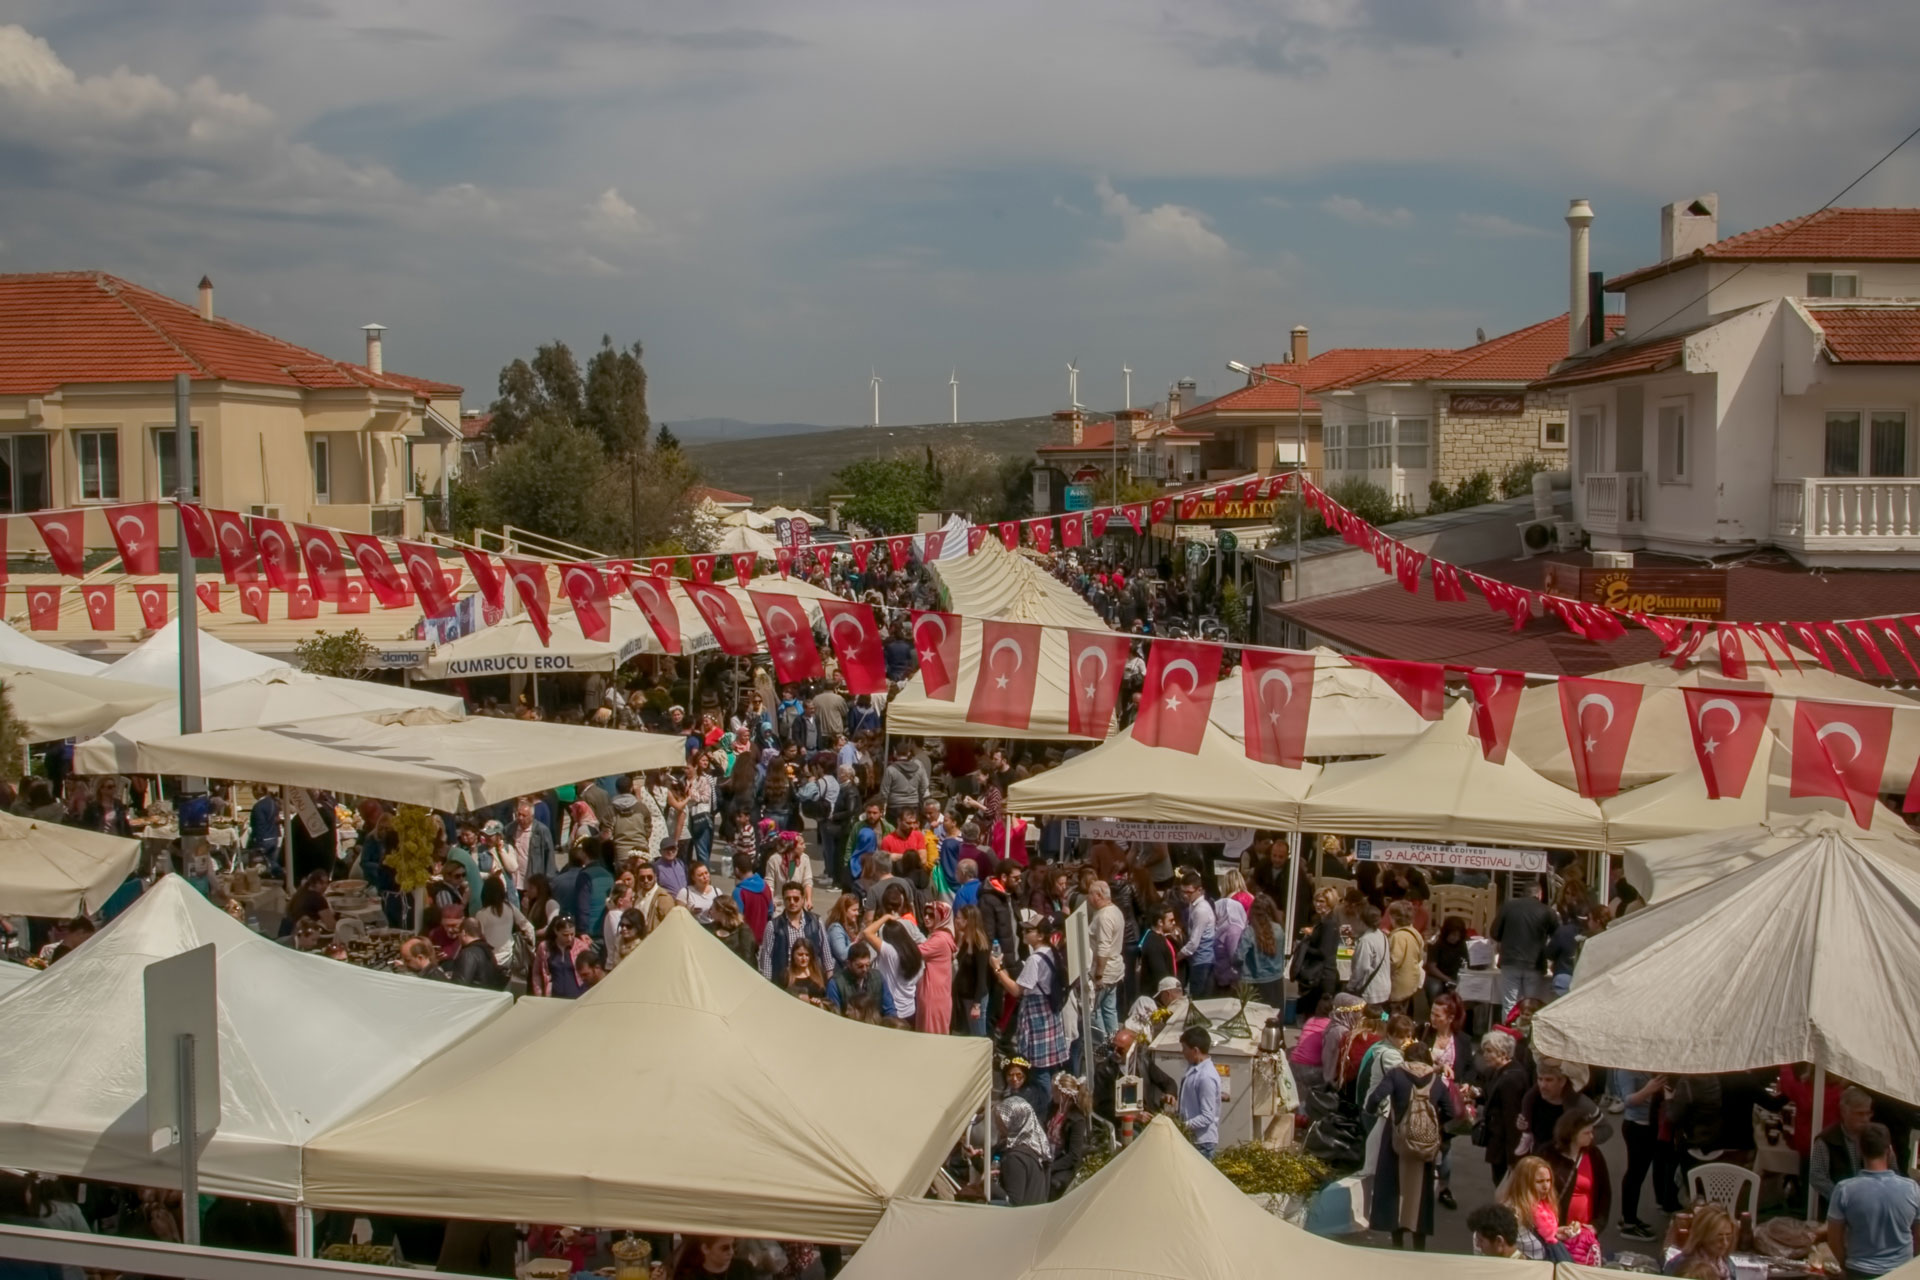 Ayder Turizm Ayderlegez Alaçatı Ot Festivali Turu www.ayder.com.tr Çekergerz Hakan Aydın